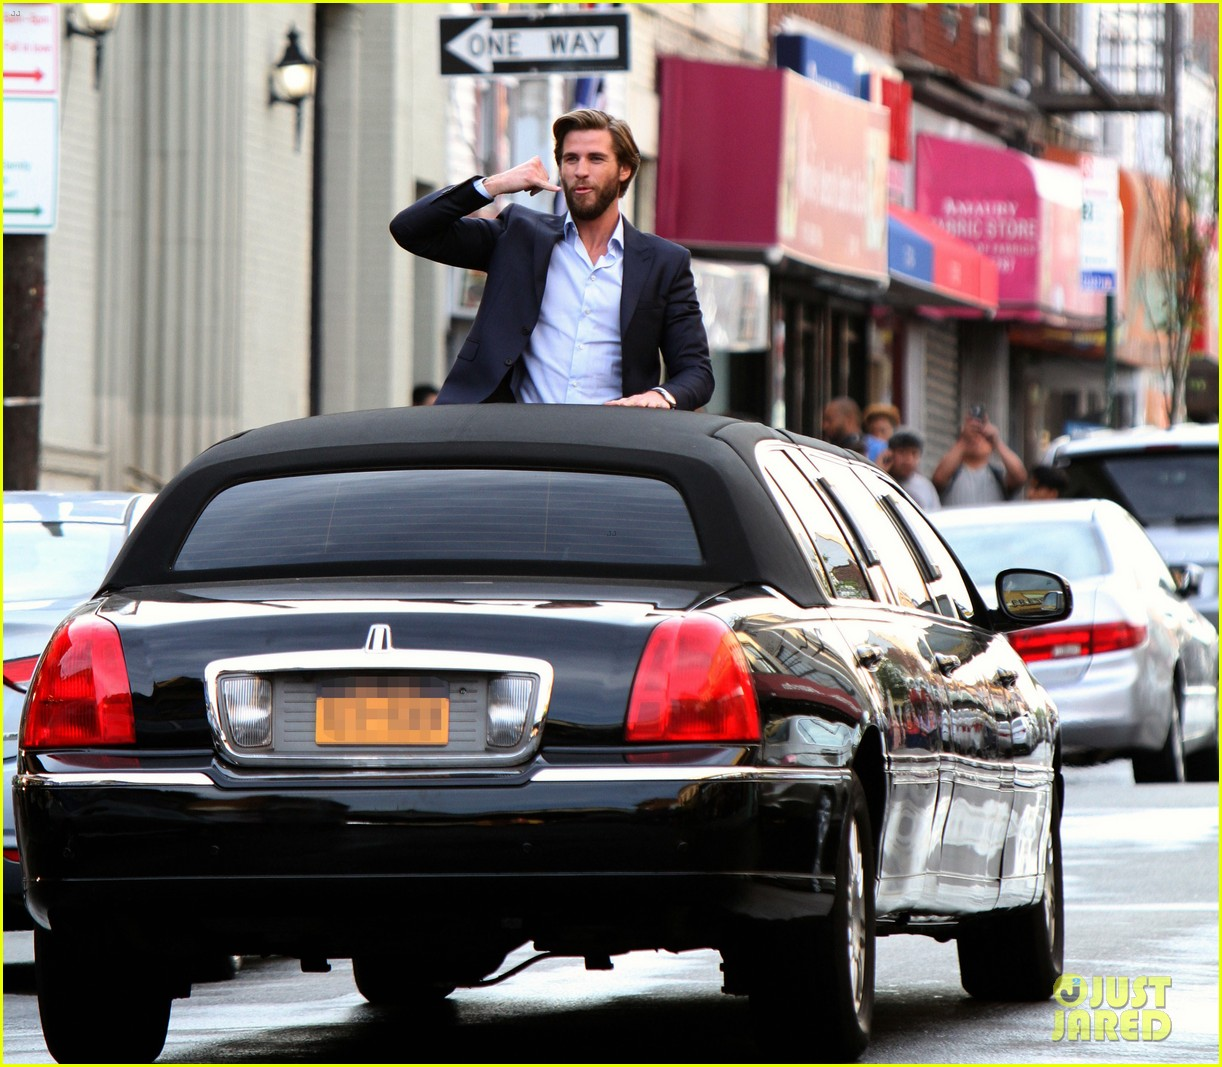 Liam Hemsworth Dawn Of A Rebel: Liam Hemsworth Has A Flower For Rebel Wilson On 'Isn't It